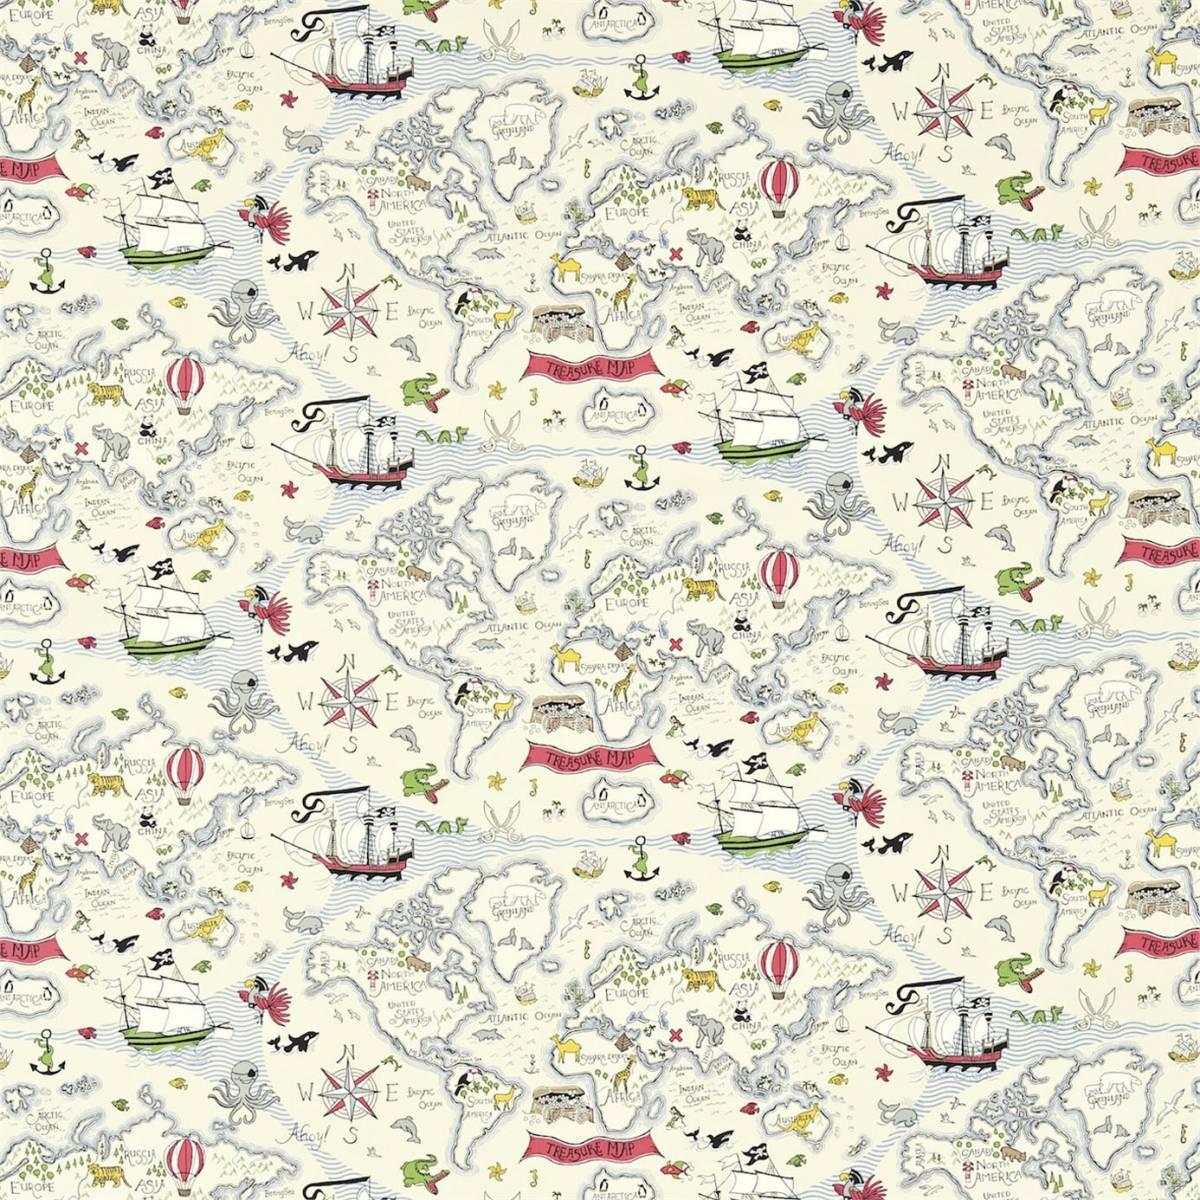 treasure map fabric vanilla 223913 sanderson. Black Bedroom Furniture Sets. Home Design Ideas